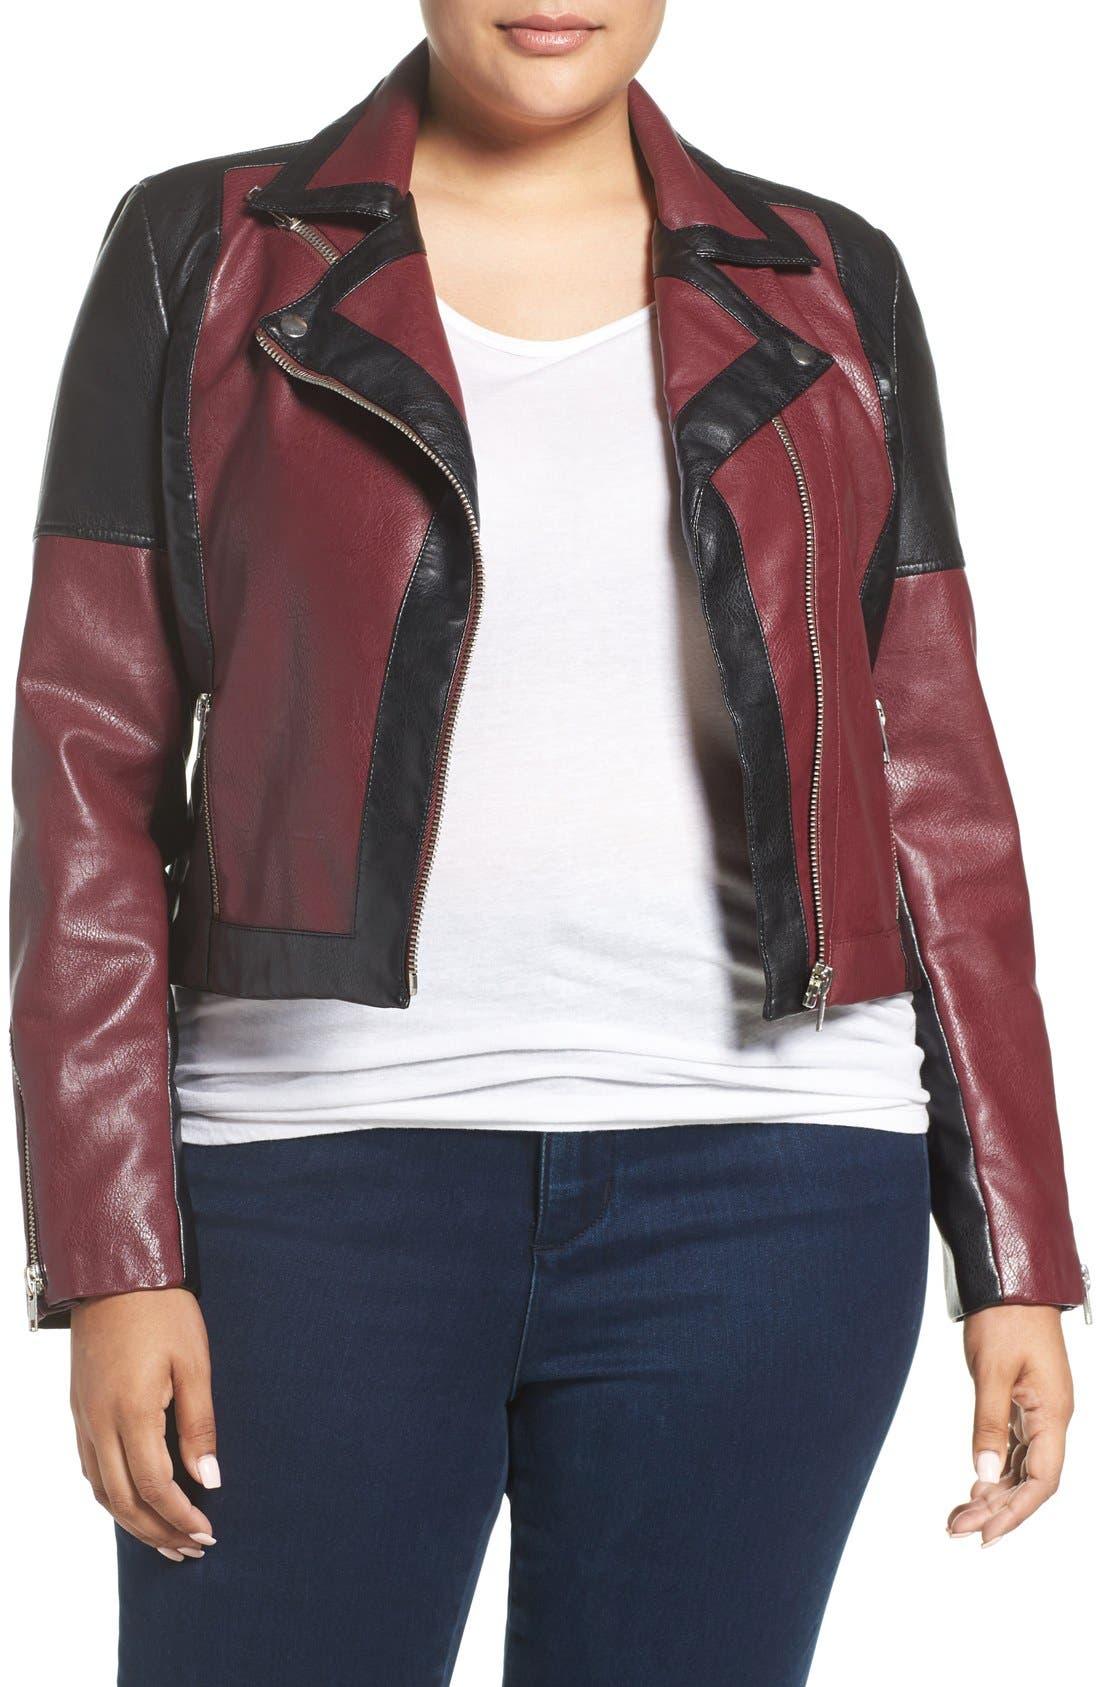 'Justine' Colorbock Faux Leather Jacket,                         Main,                         color, Tawny Port/ Black Combo